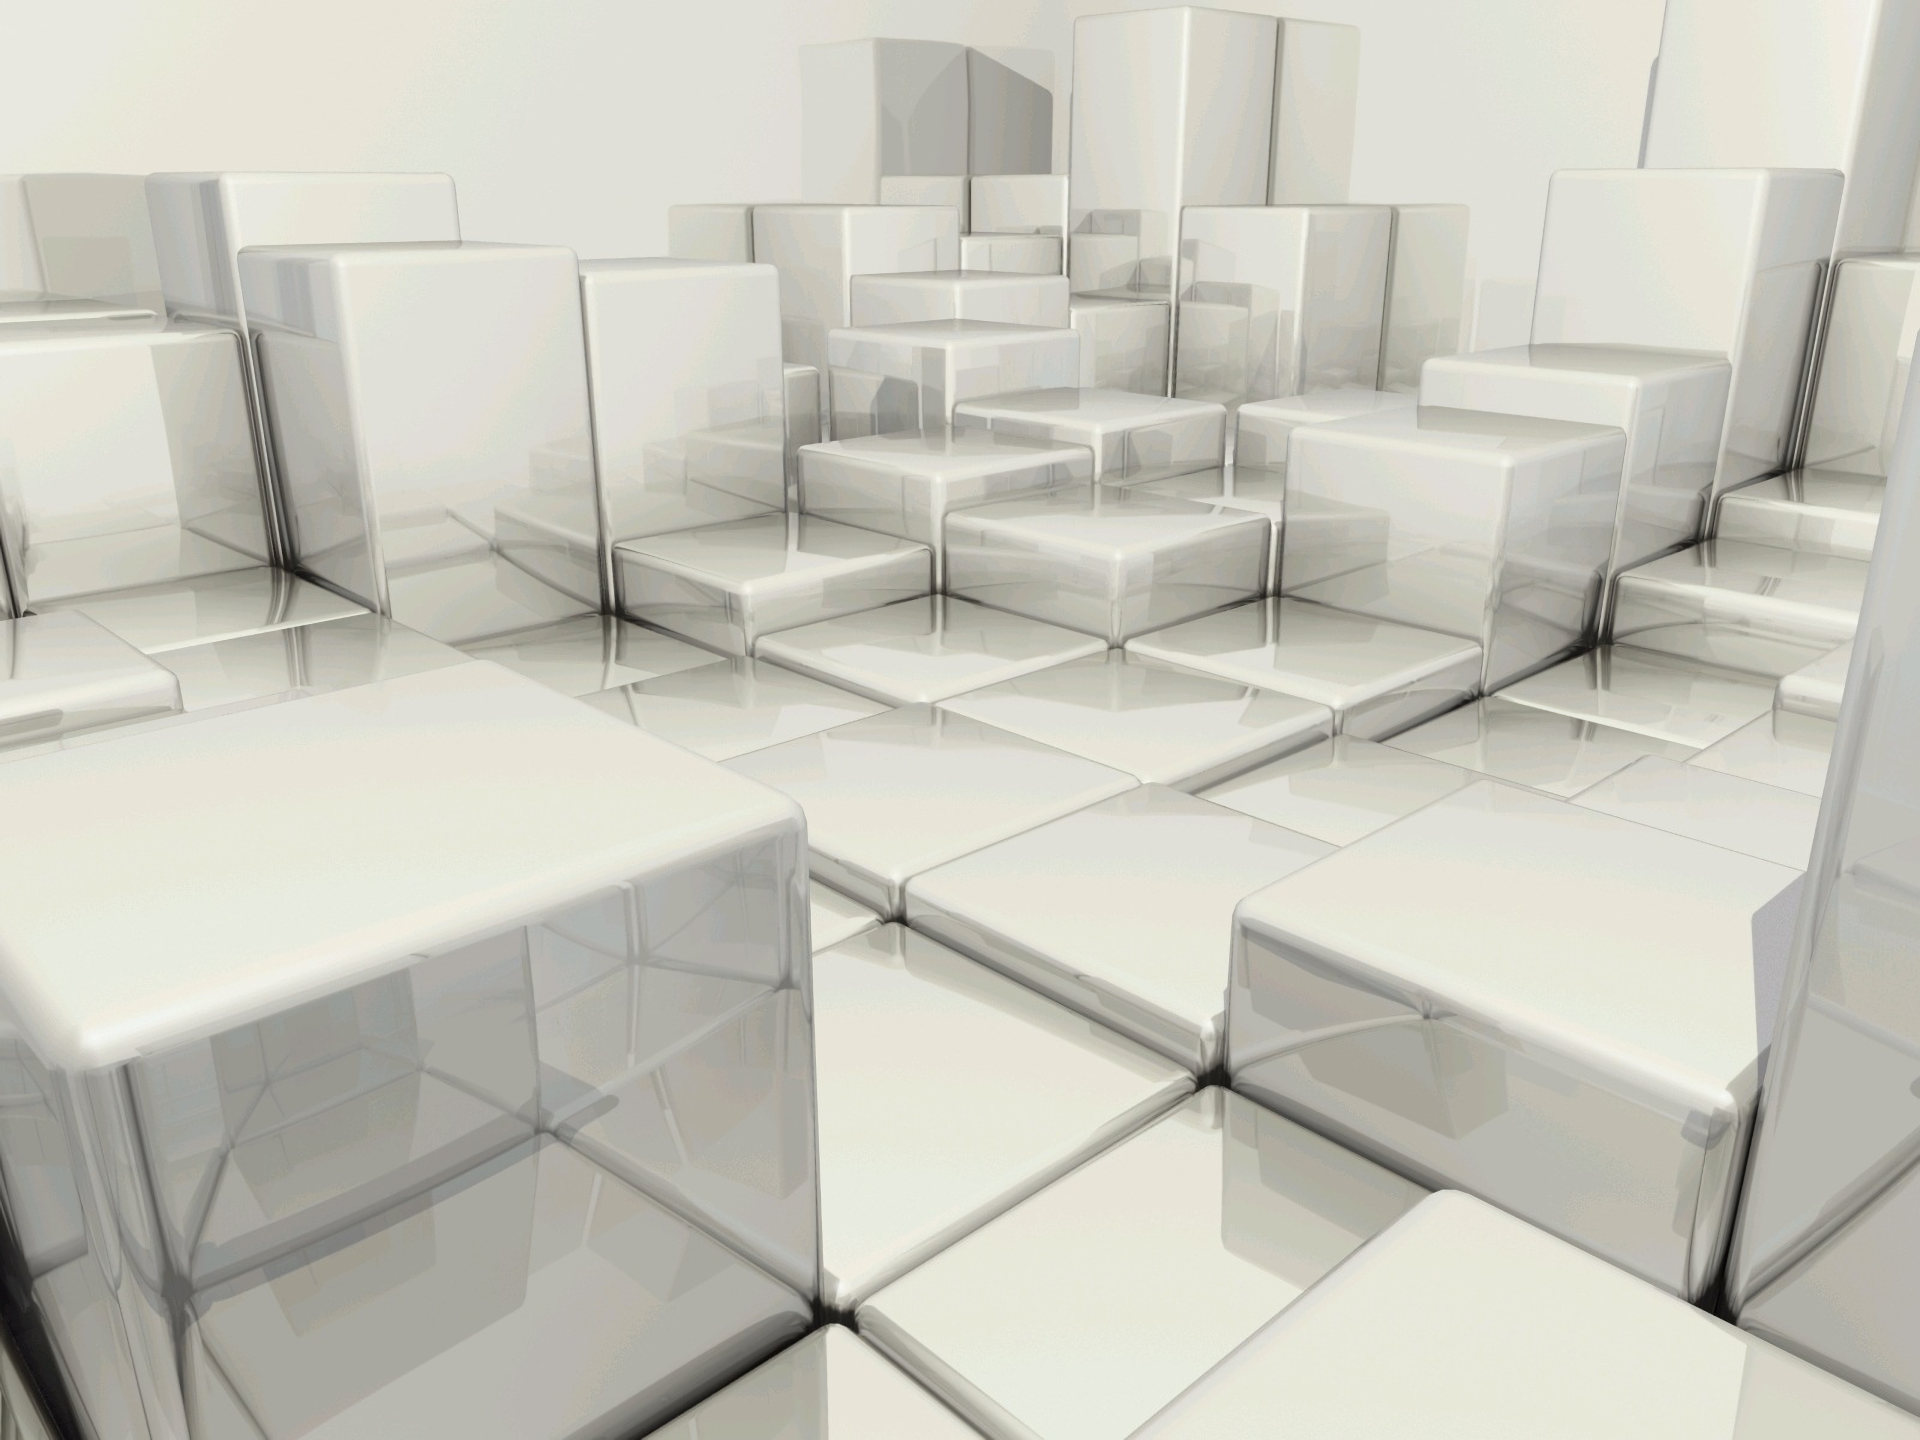 Abstract - Cube  Abstract Digital Art CGI 3D Wallpaper